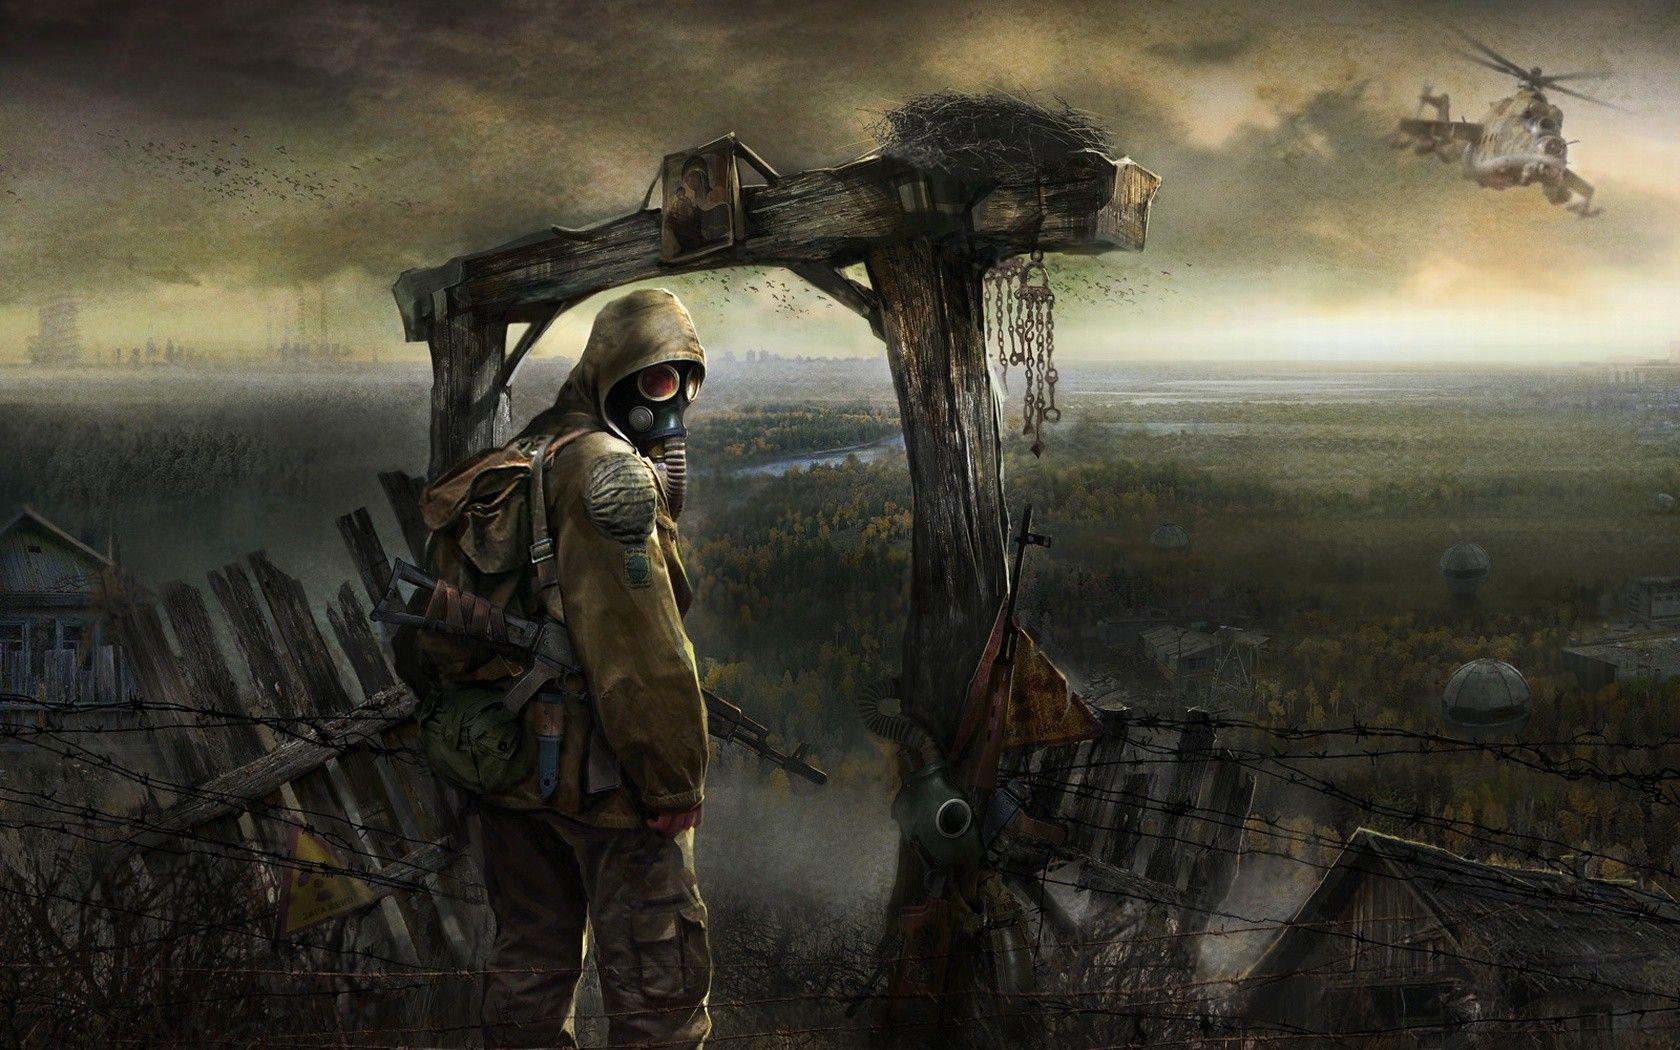 apocalyptic, video games, Ukraine, artwork, gas masks